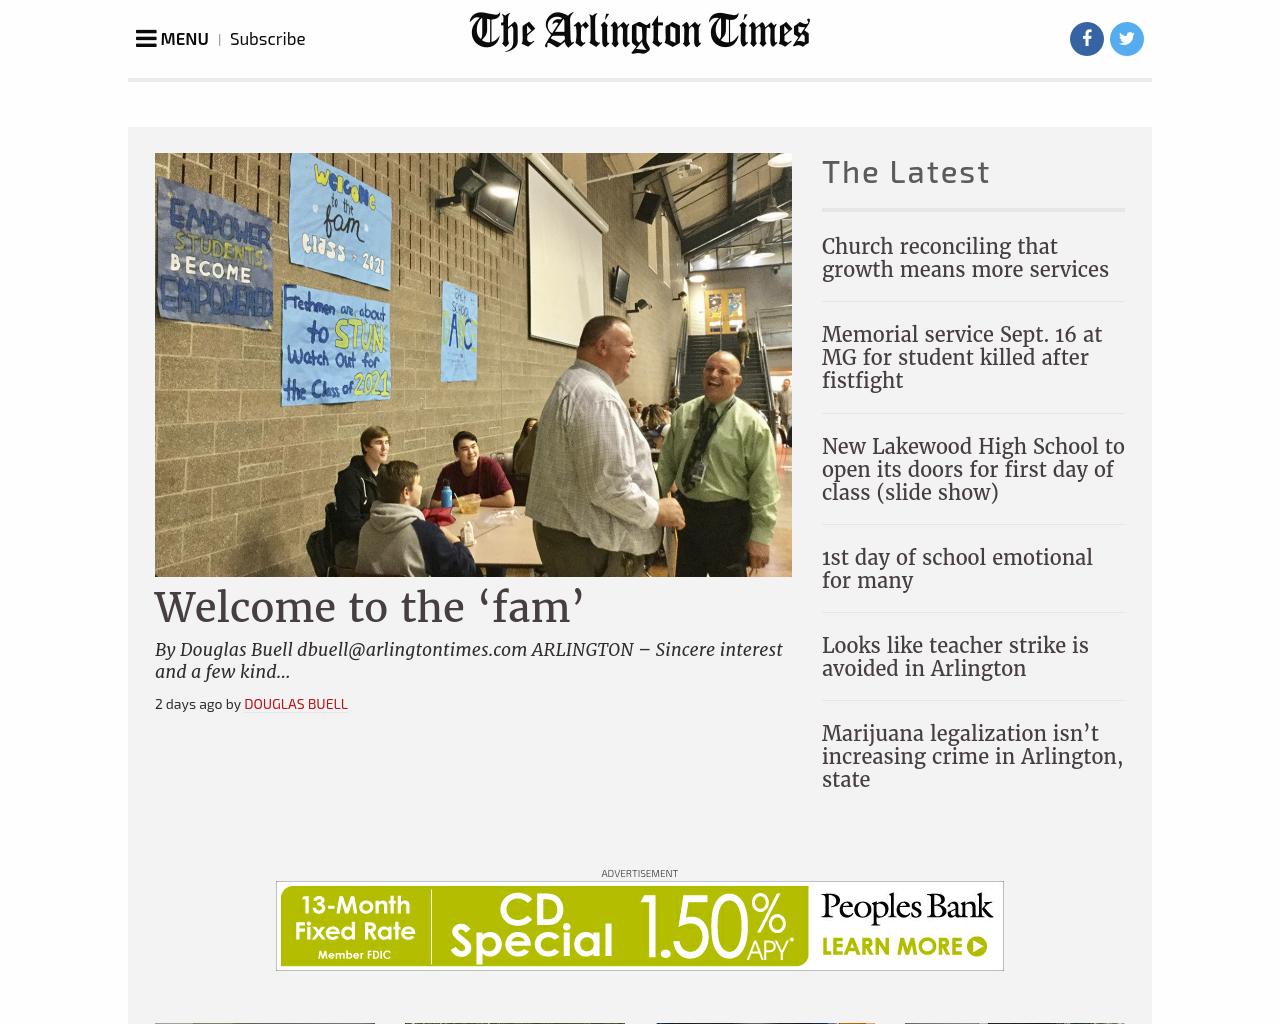 The-Arlington-Times-Advertising-Reviews-Pricing